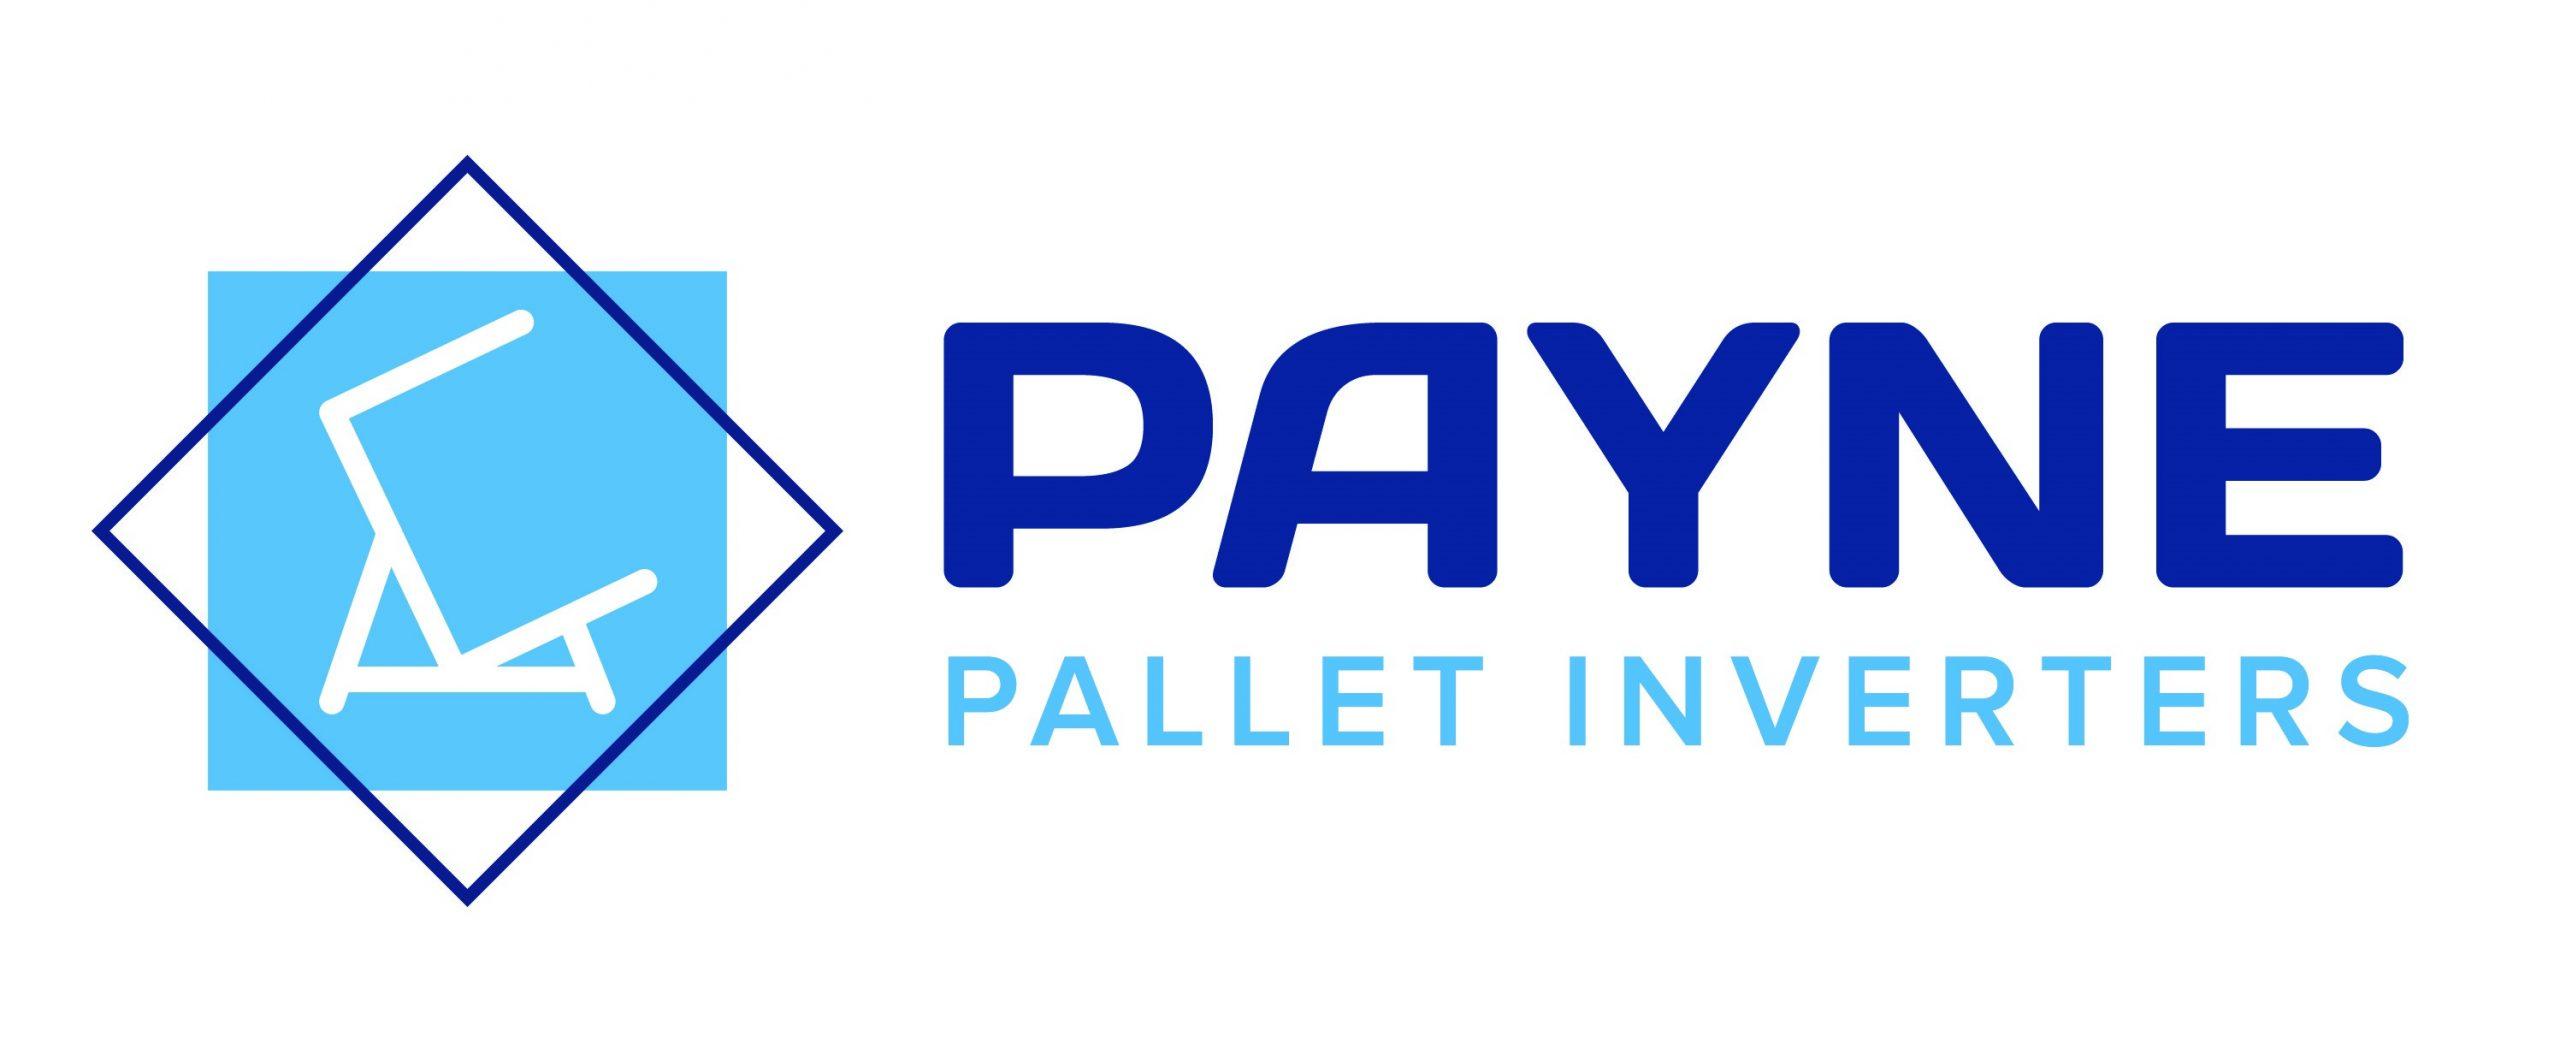 Payne Pallet Inverters ATS Groep Logitrans